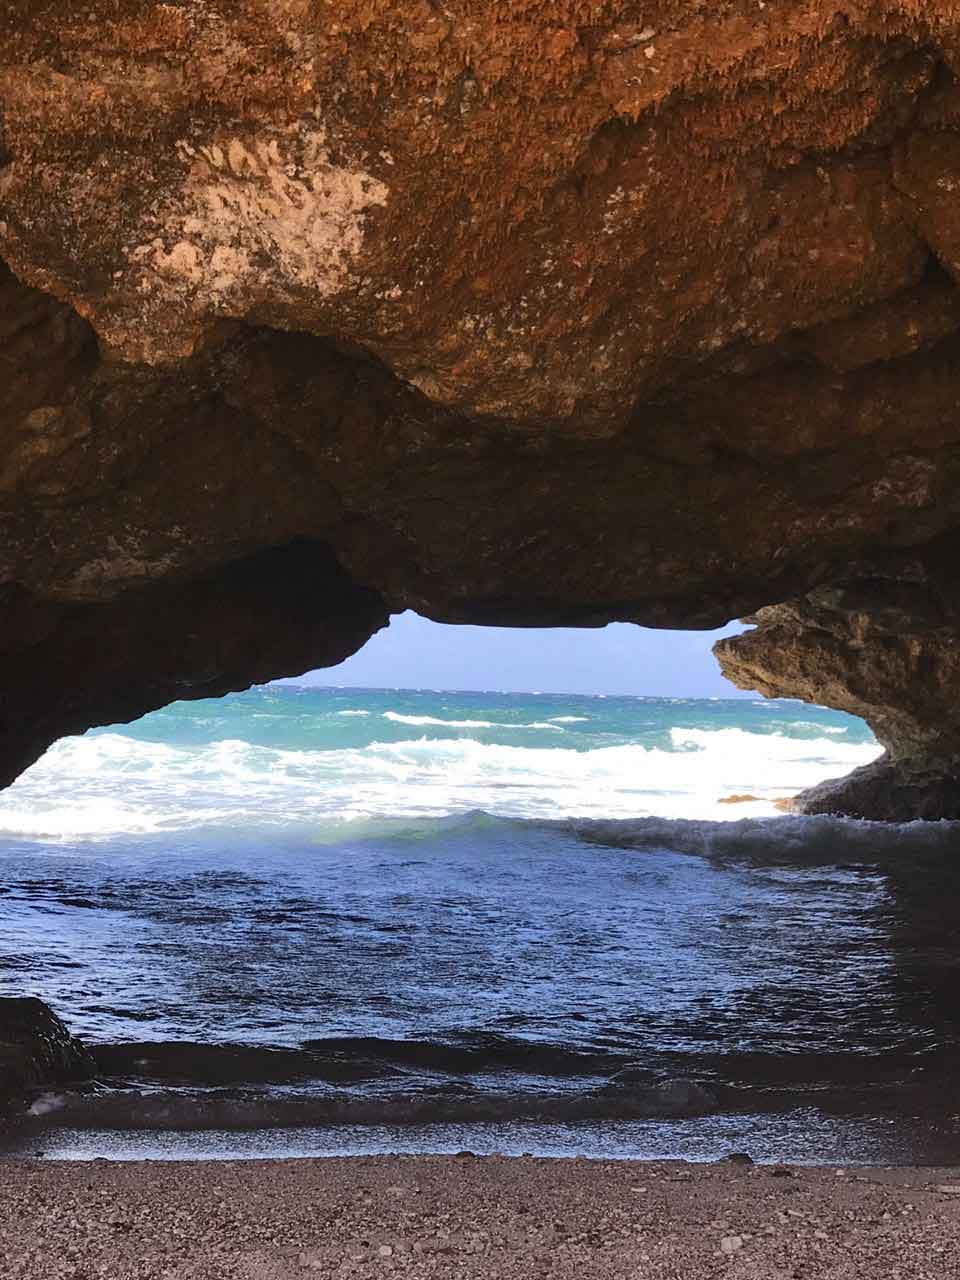 Vakantiewoning Aruba Noord kust - OMGEVING